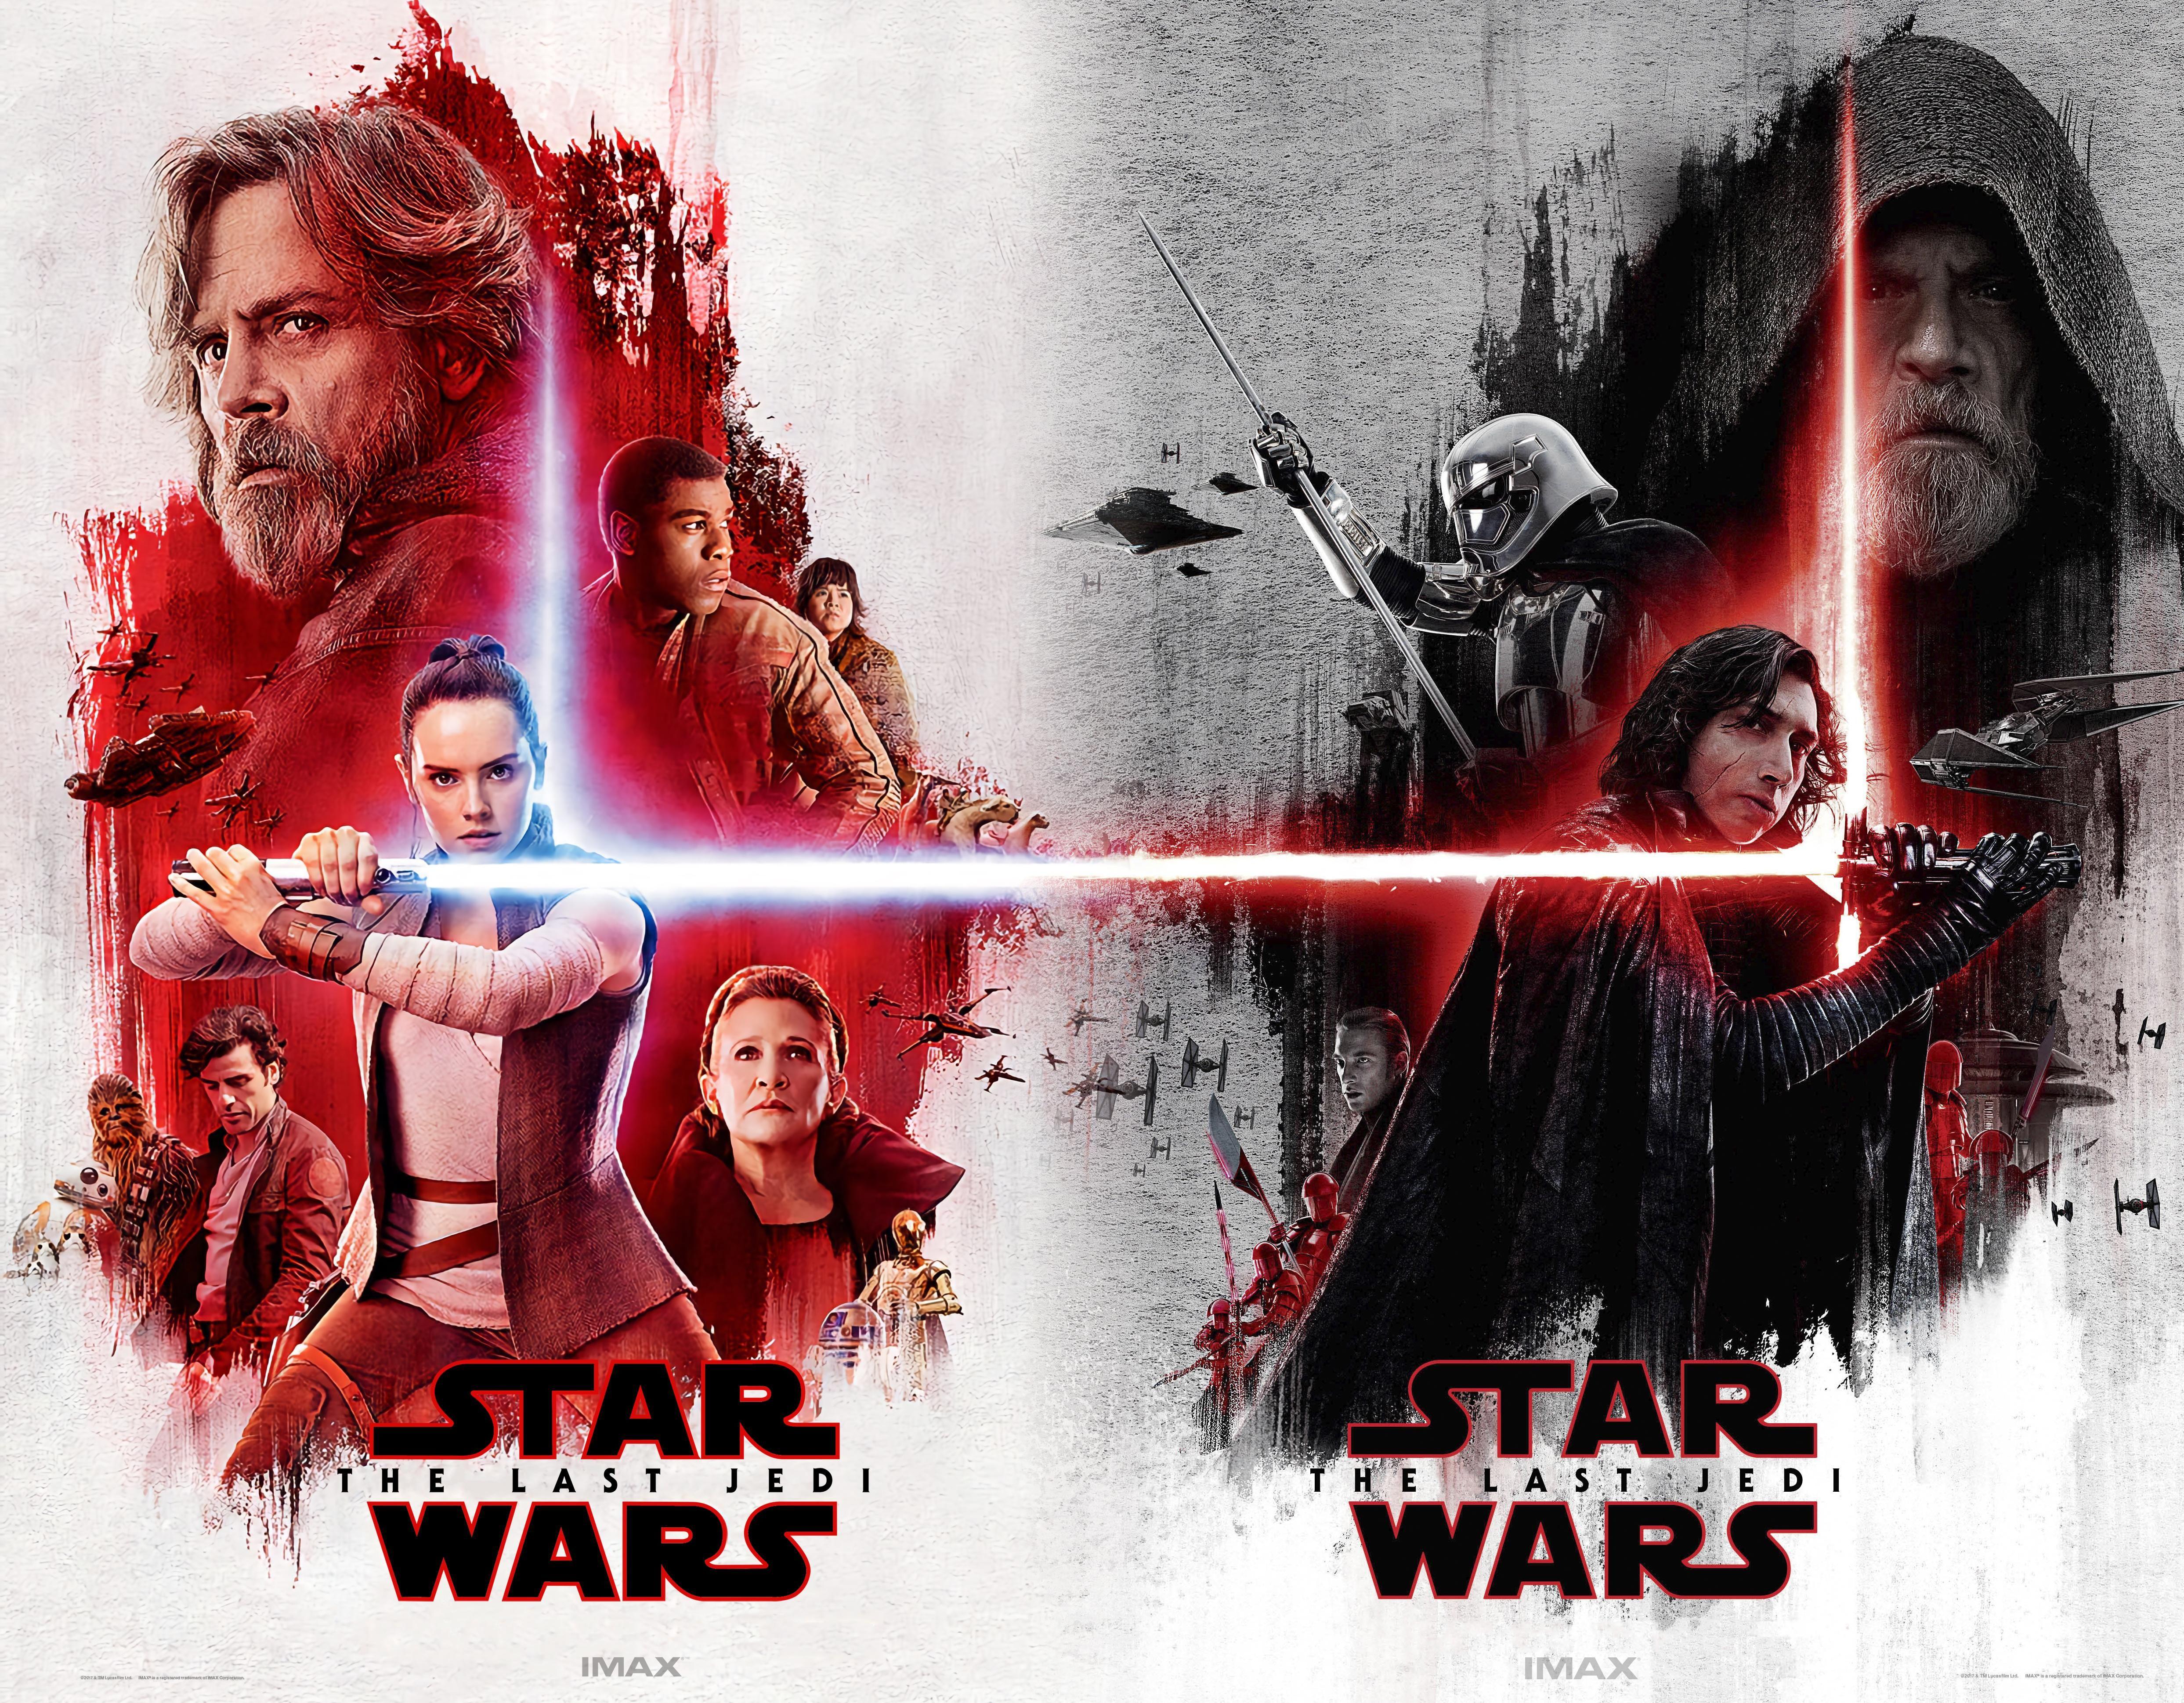 STAR WARS; THE LAST JEDI Movie PHOTO Print POSTER Rise Skywalker Set of 4 IMAX